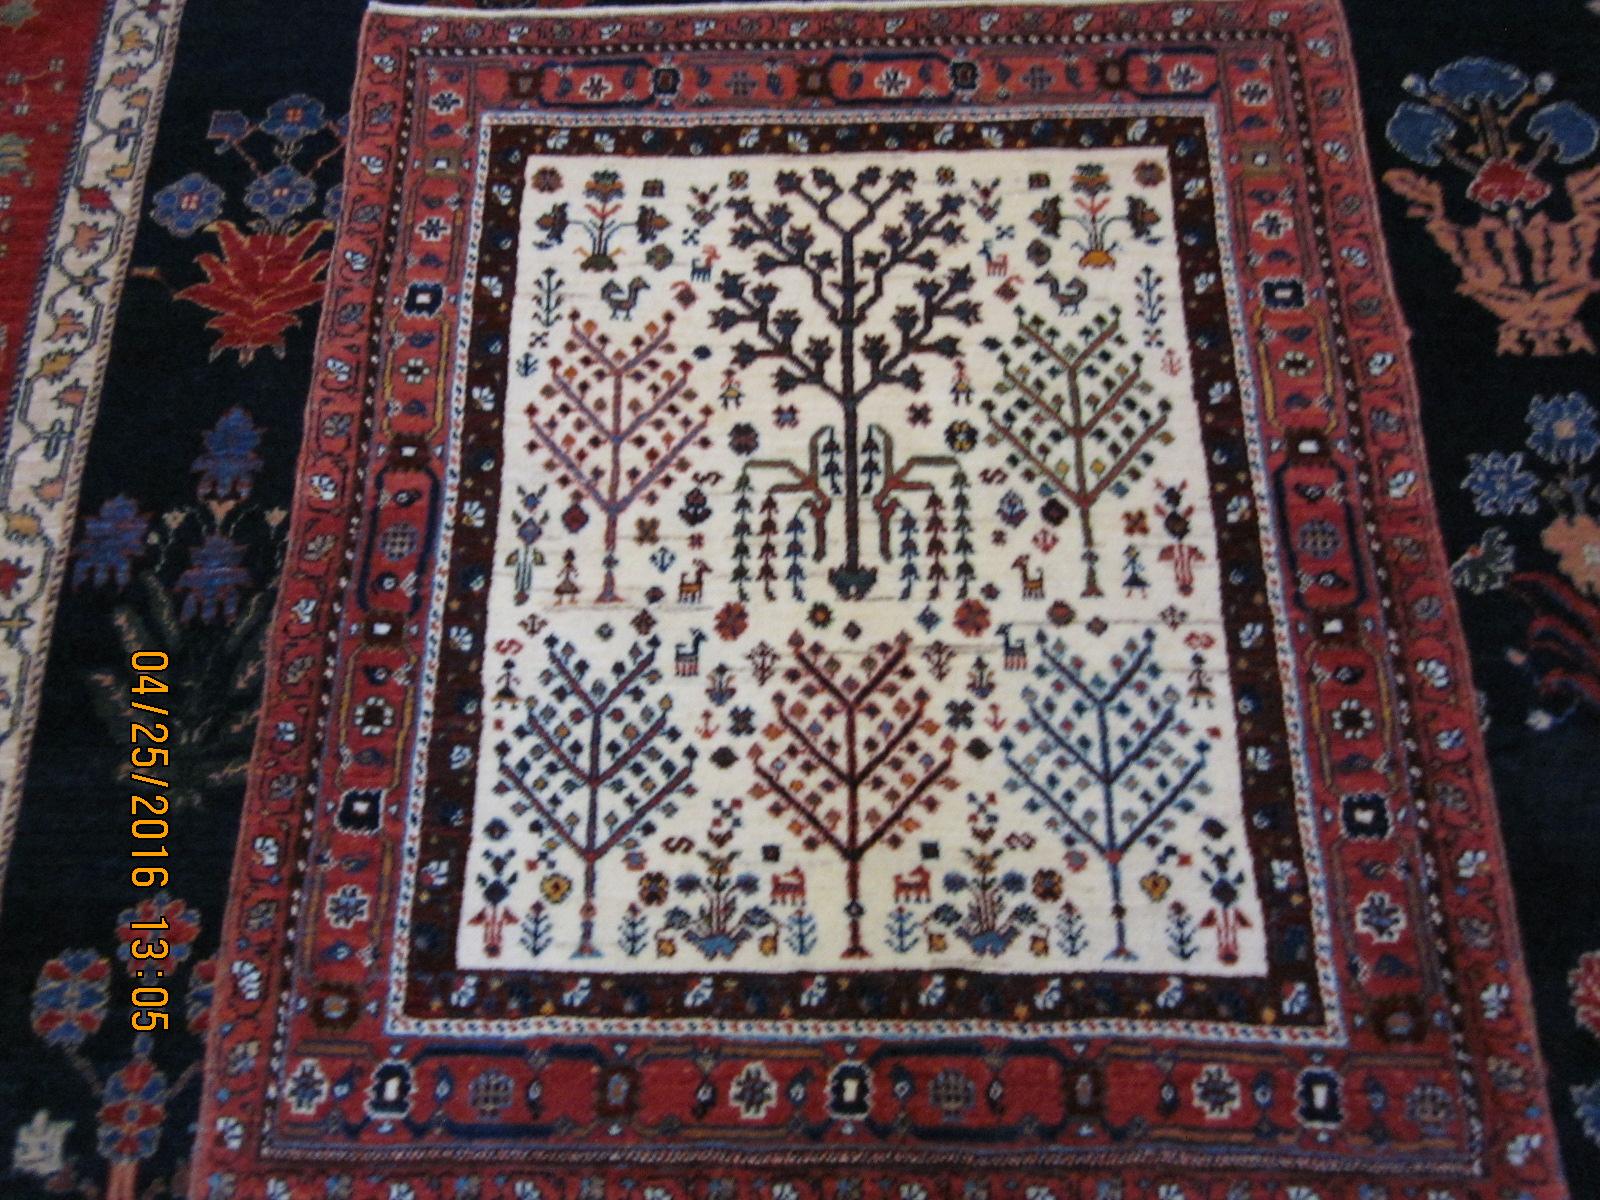 Enchanting small Tree of Life rug.